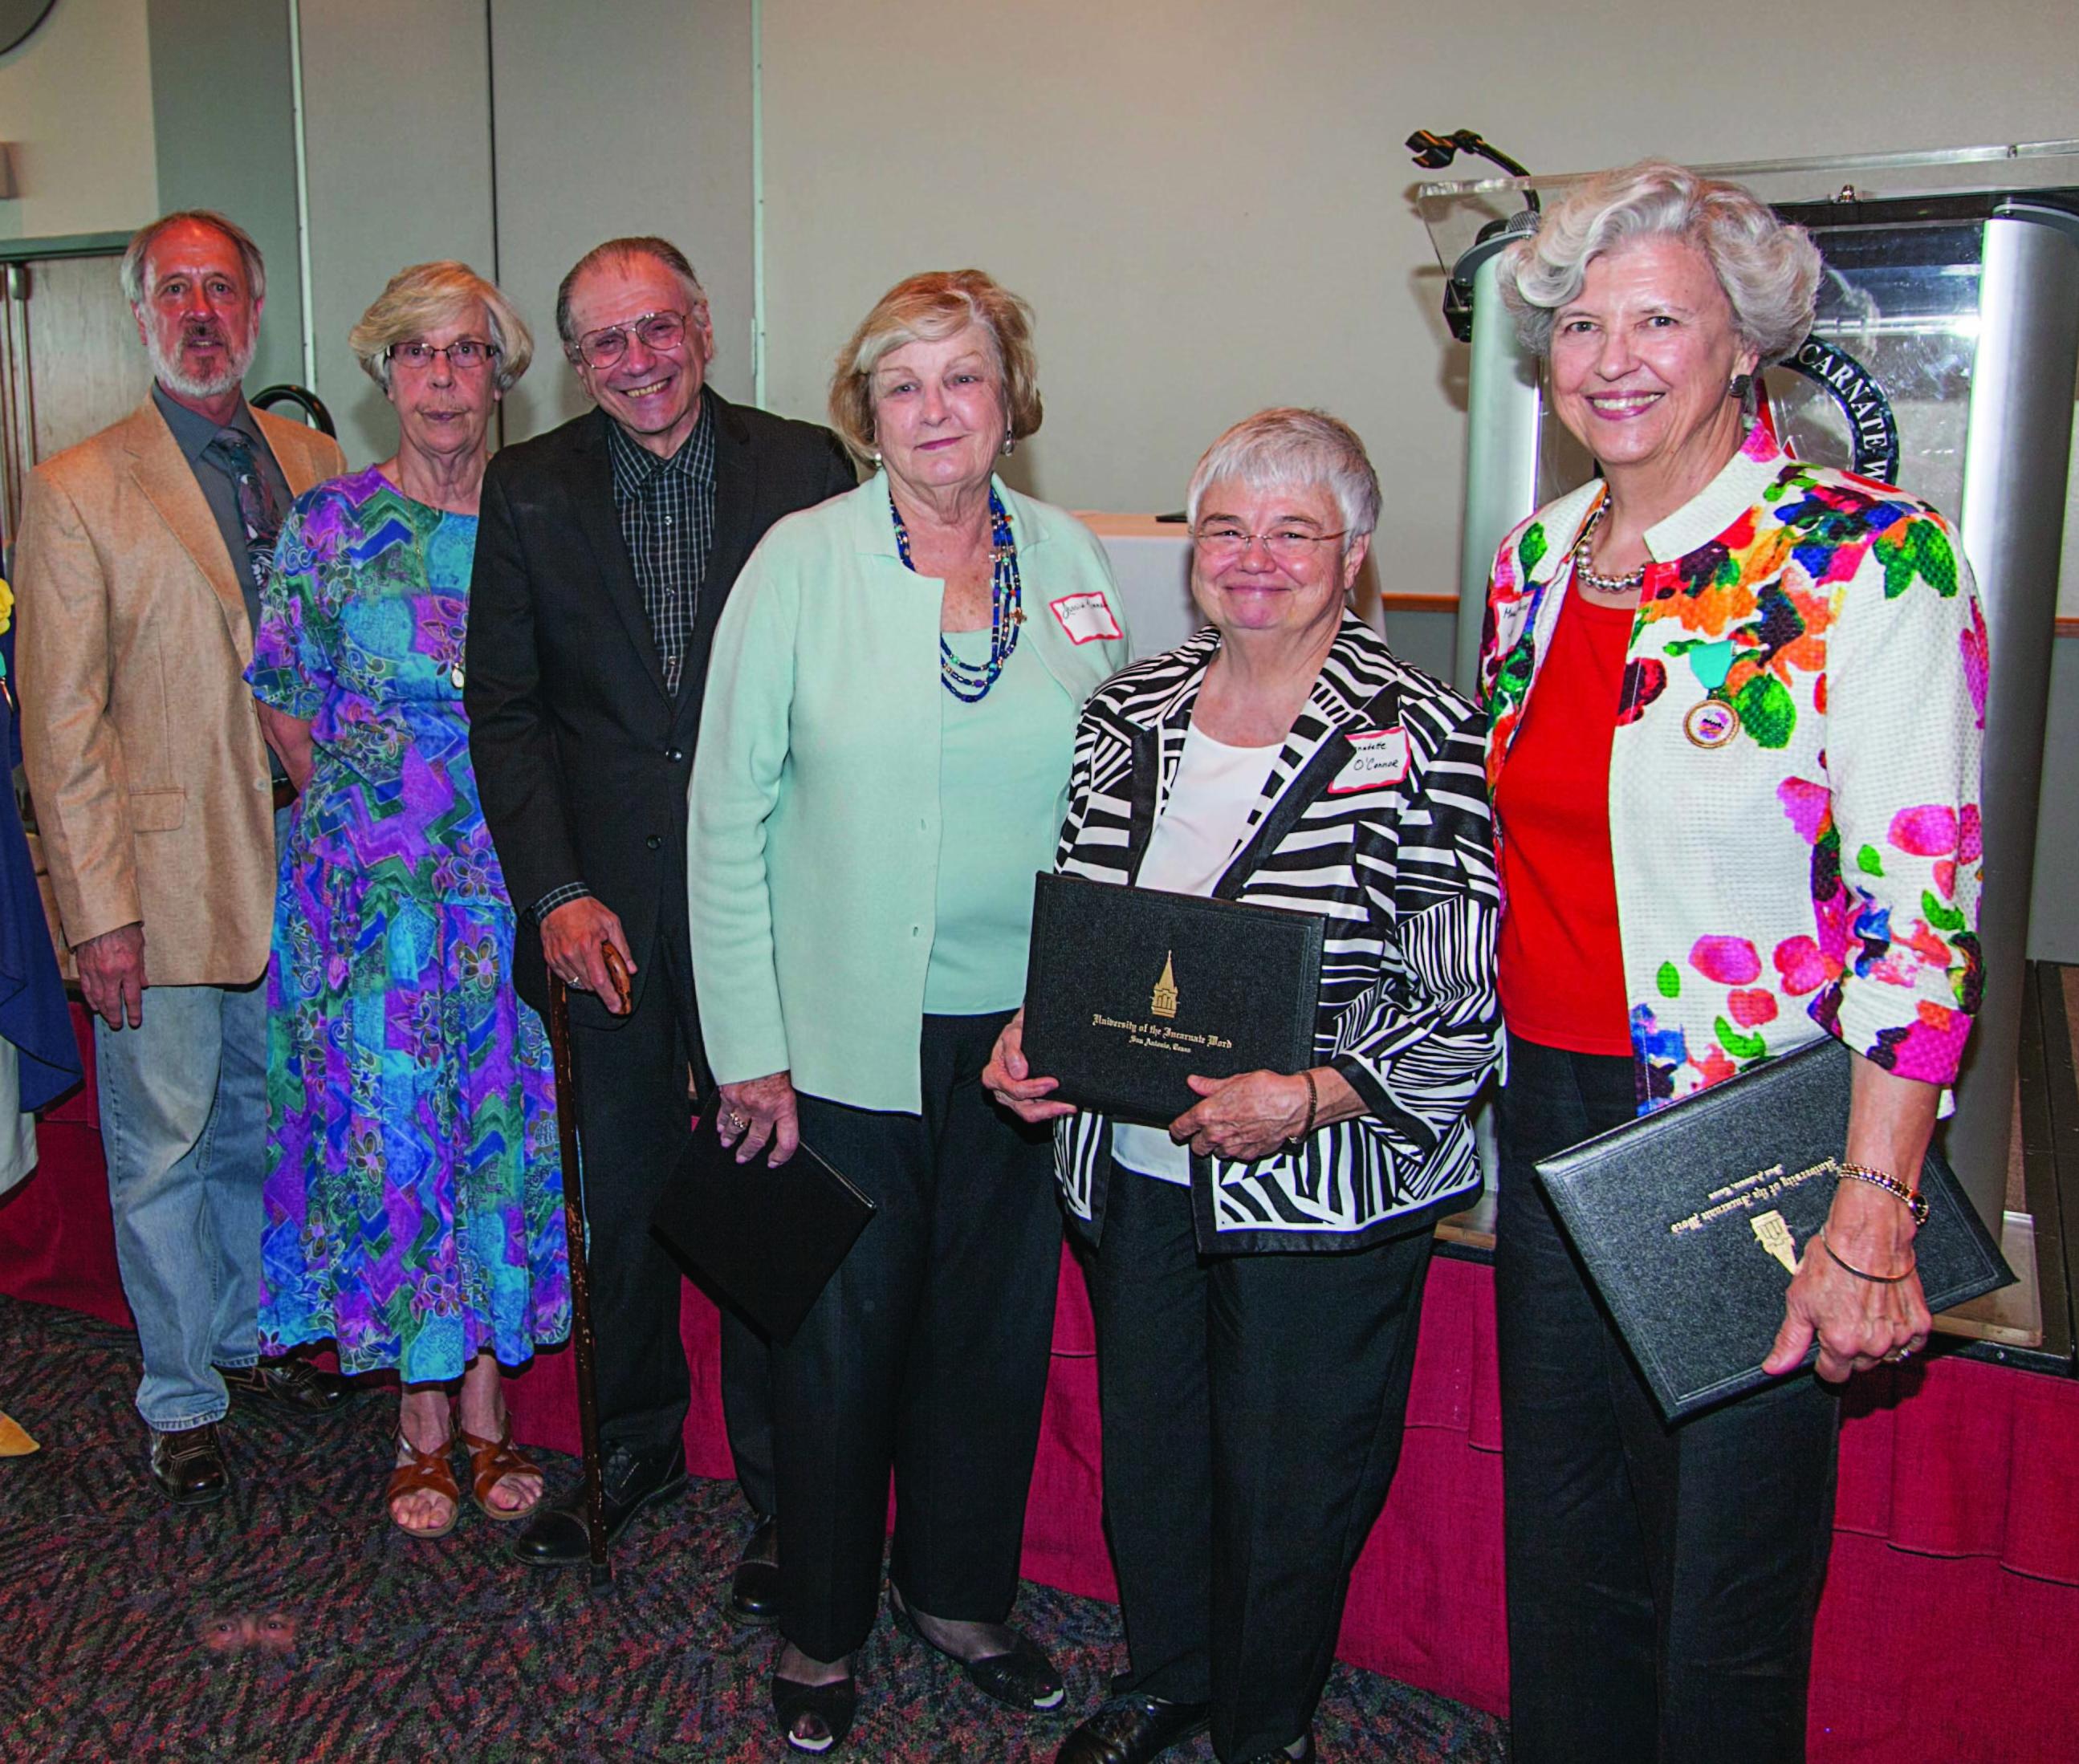 UIW bids farewell to retirees